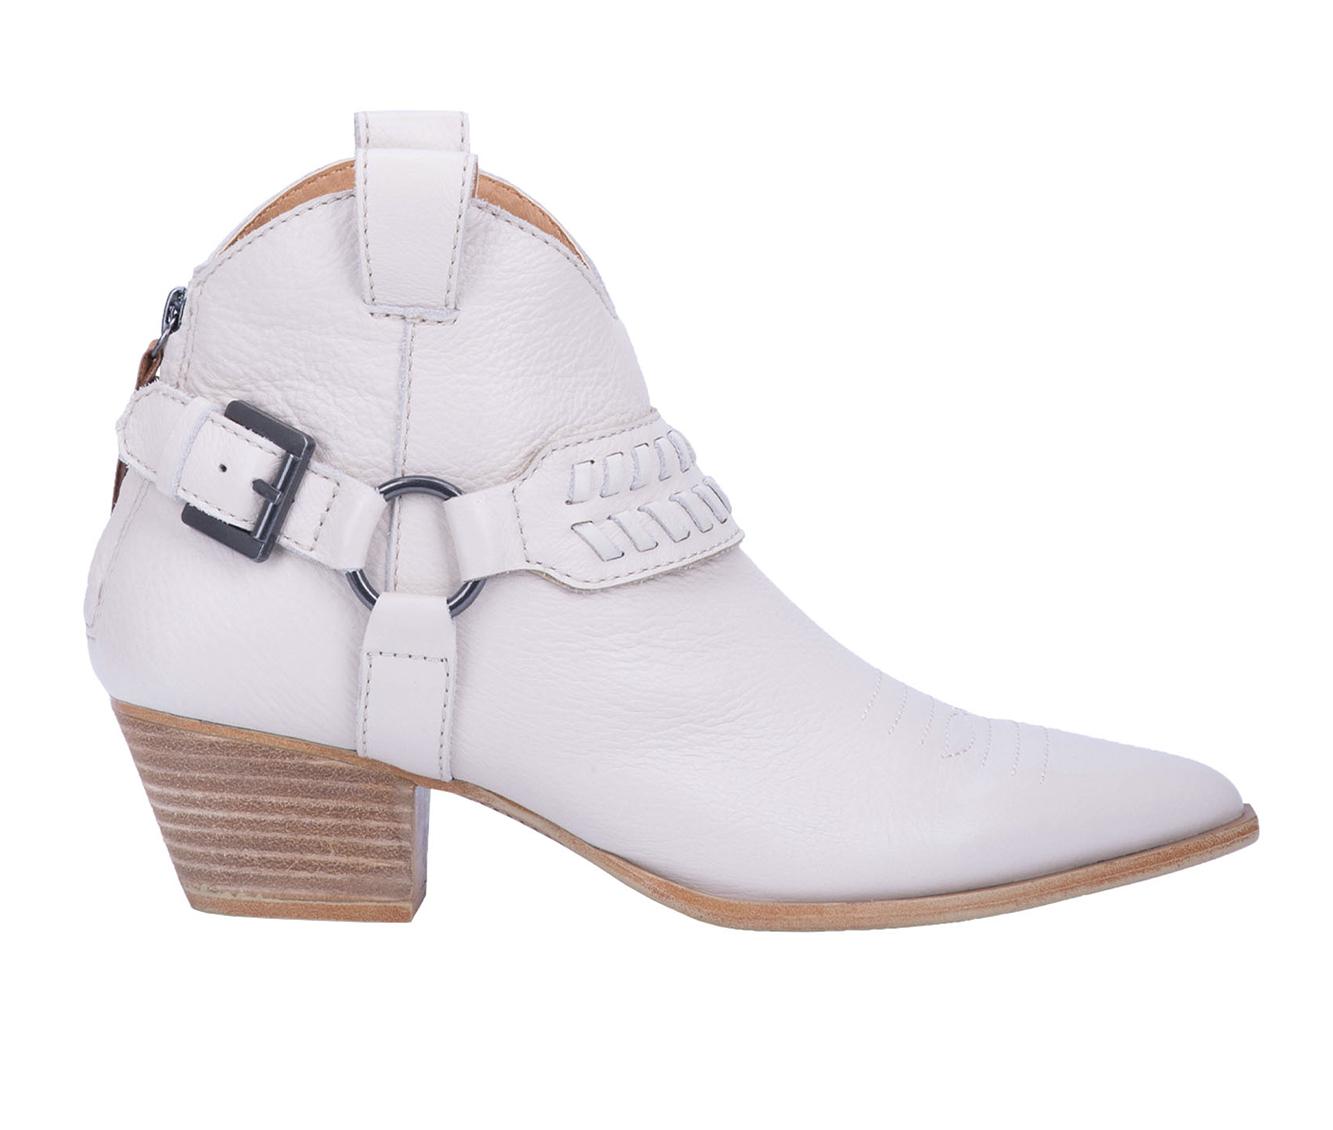 Dingo Boots Keepsake Women's Boots (White - Leather)